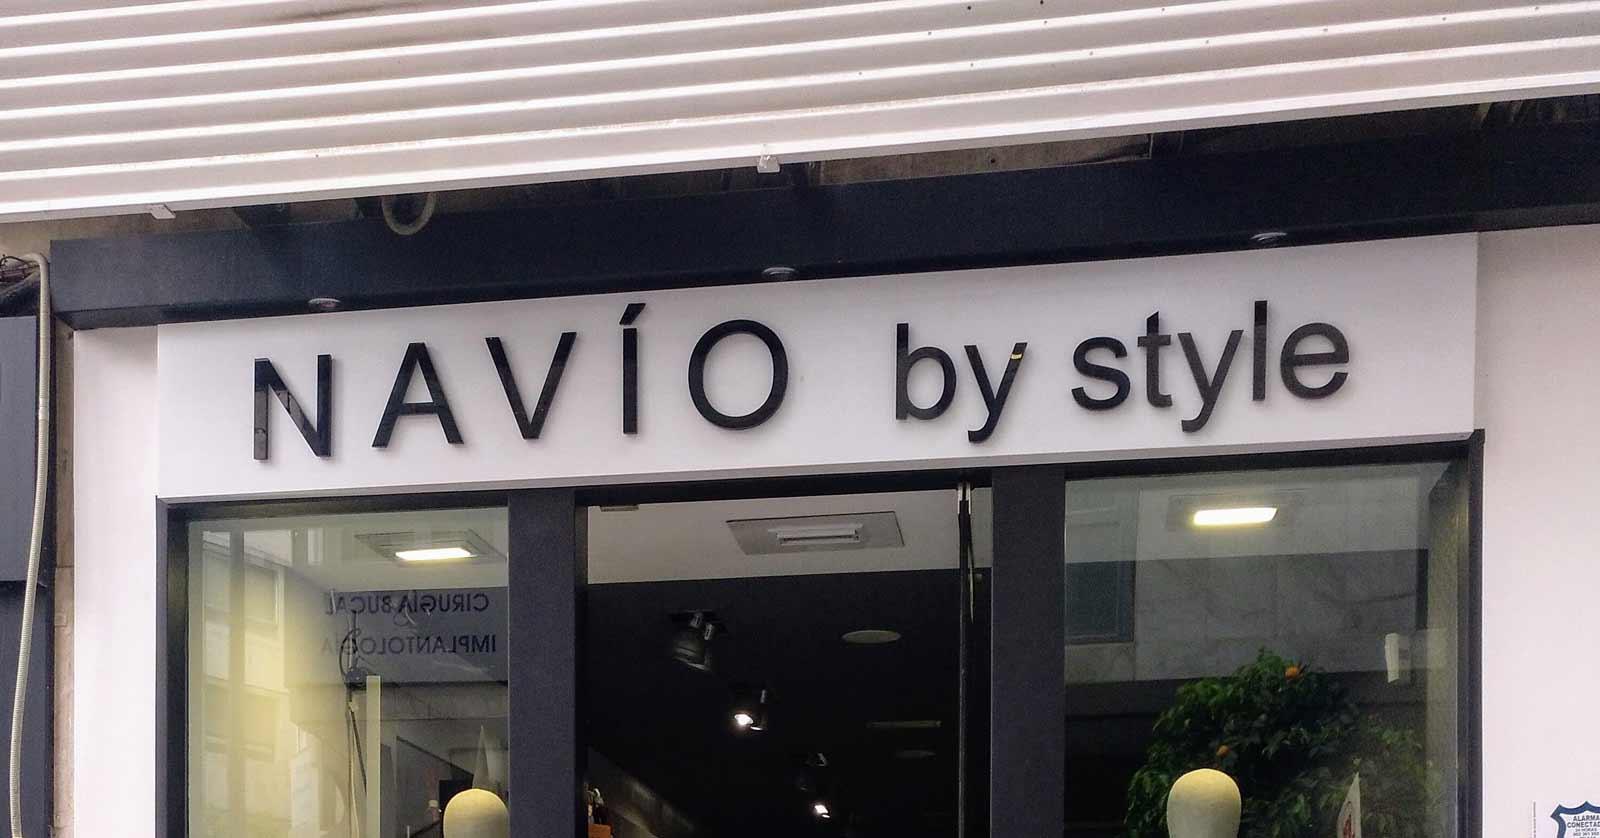 N A V Í O by style